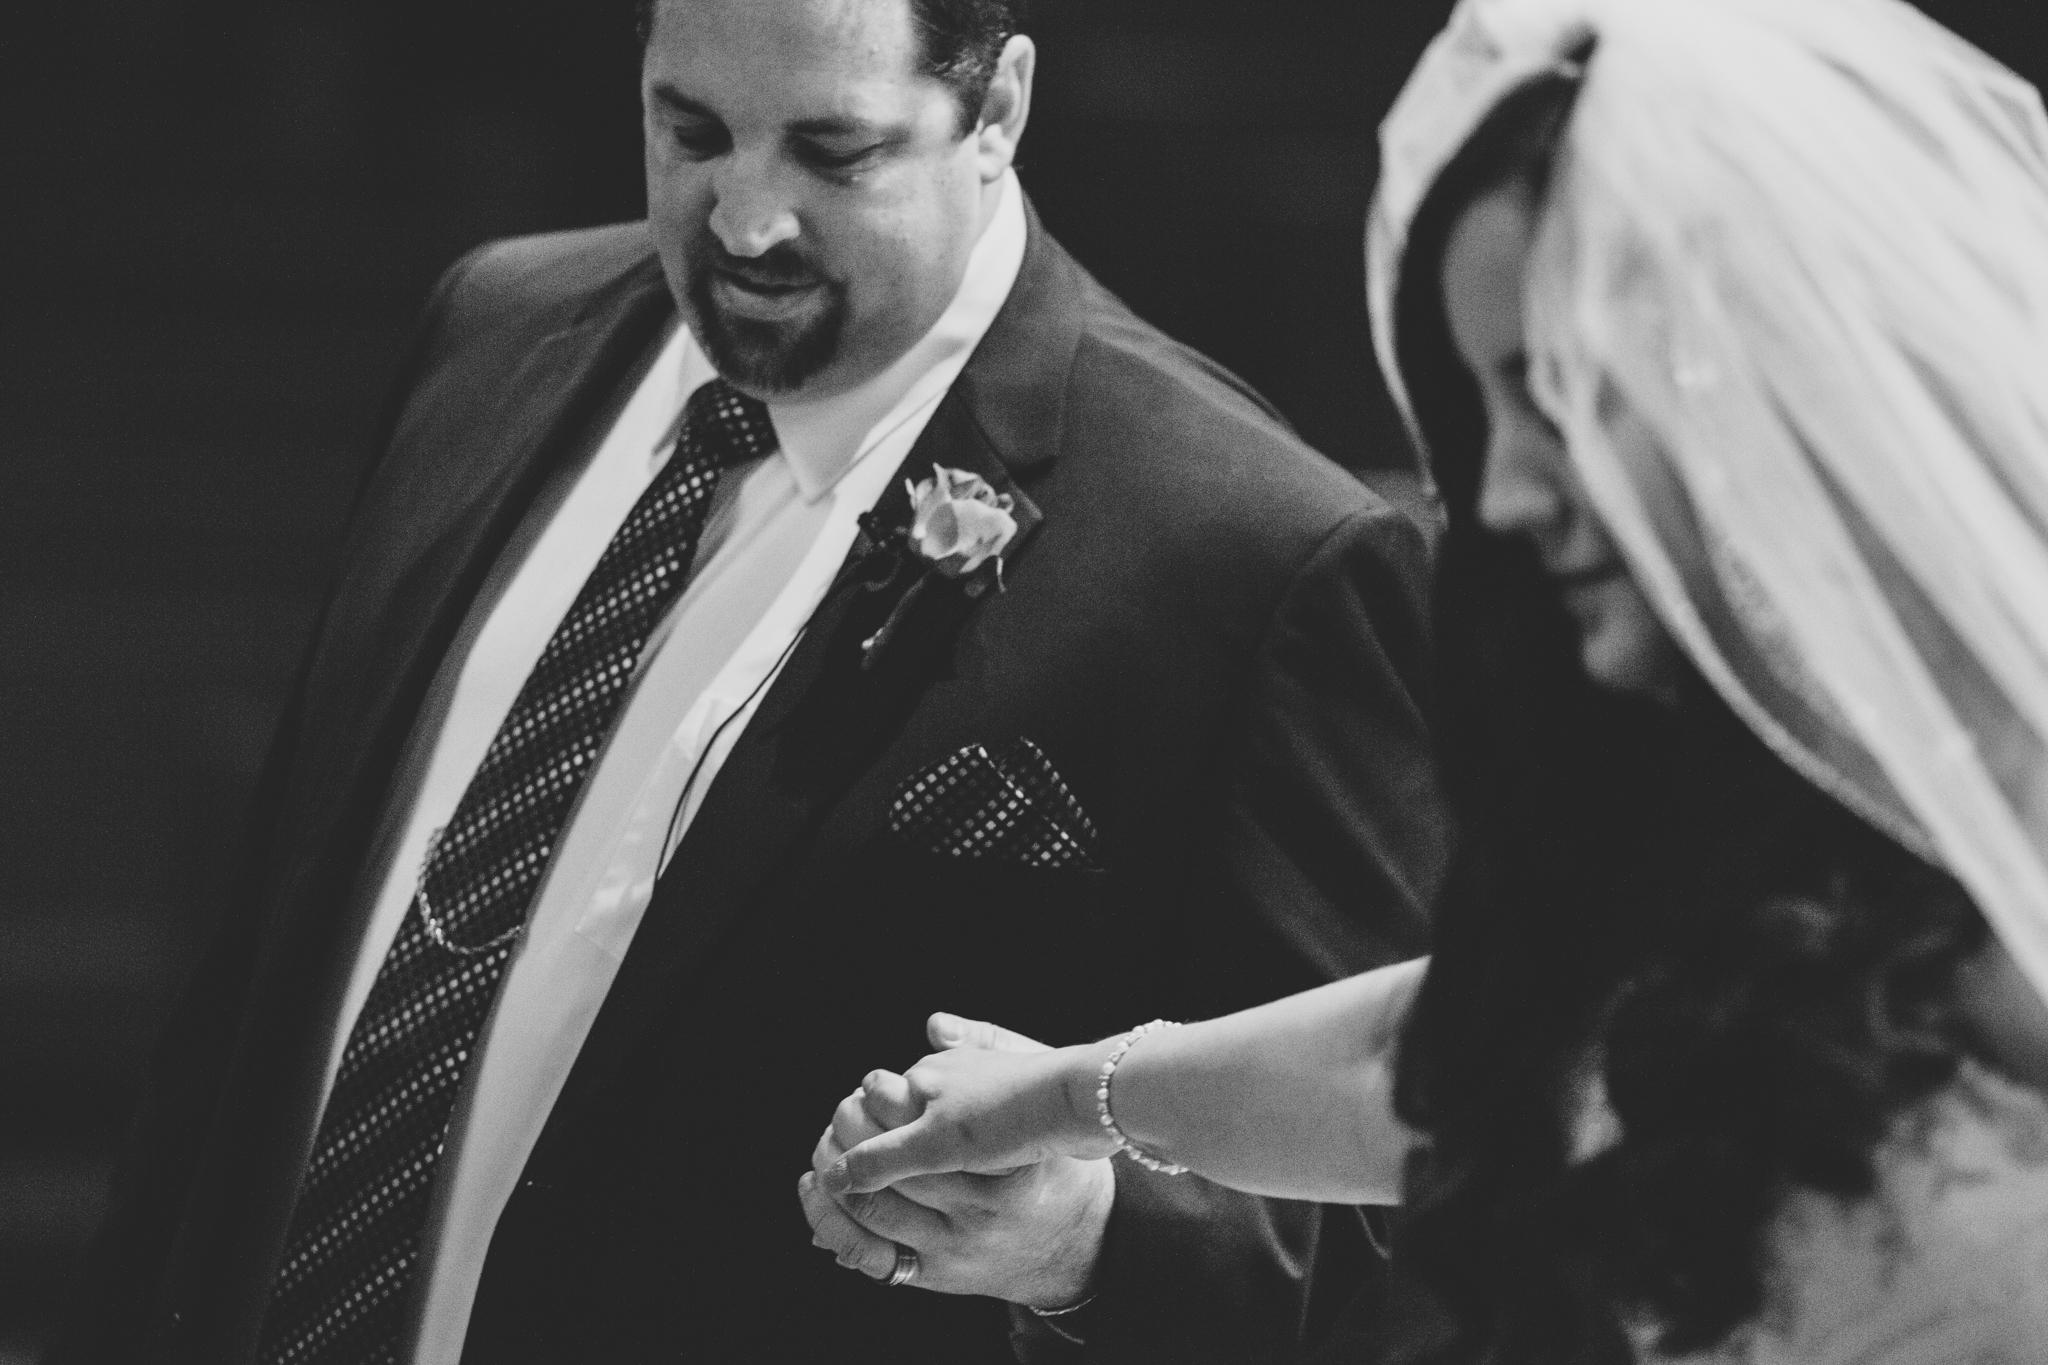 rs groom takes brides hand ceremony oklahoma city